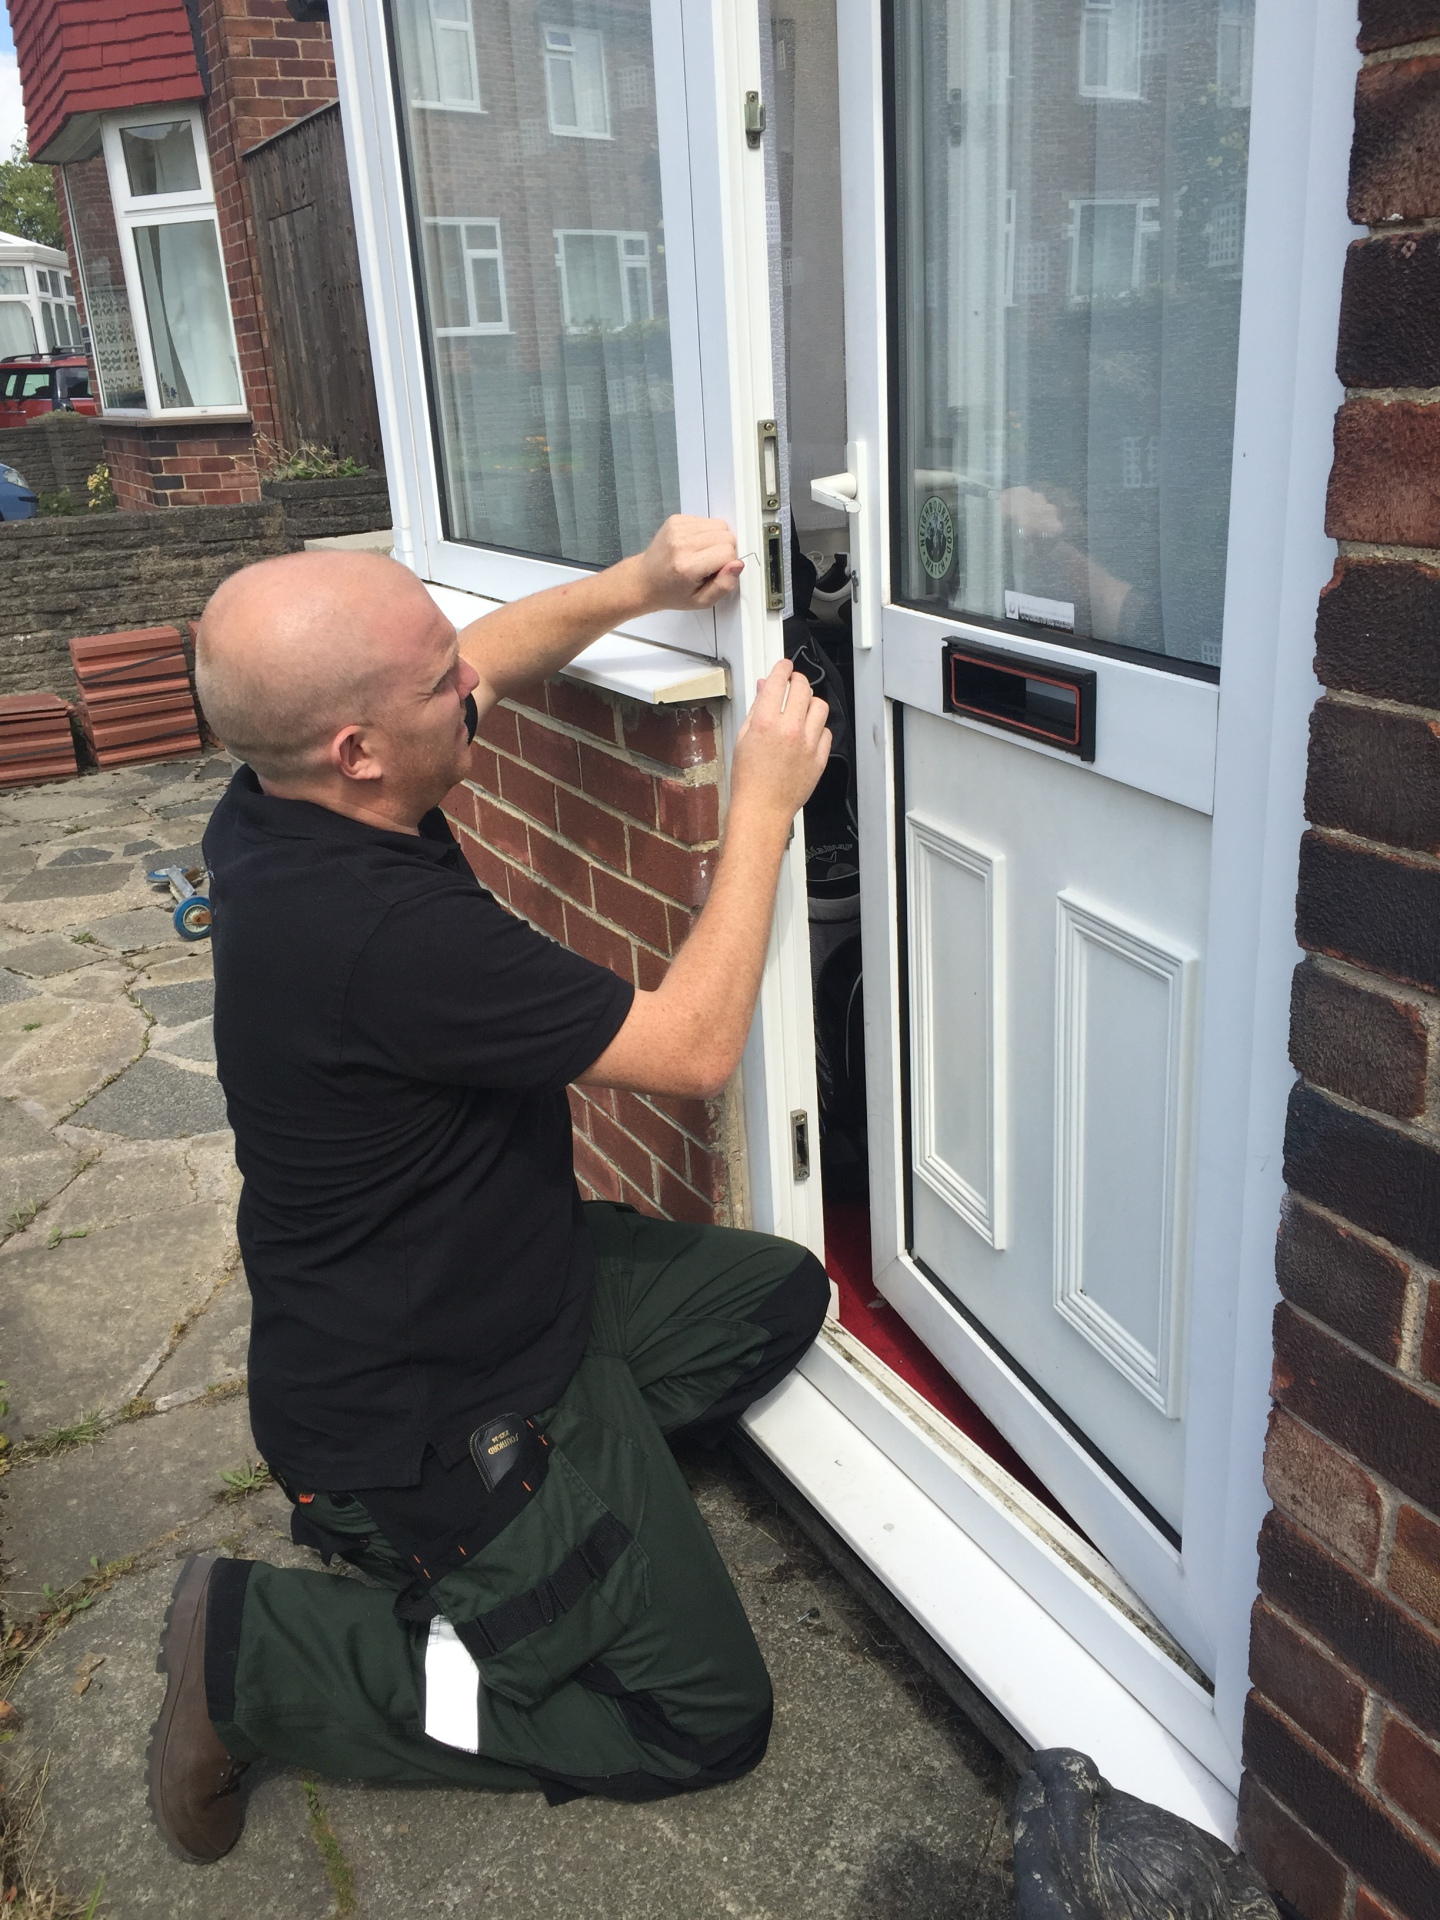 Locksmith Picked Door Open